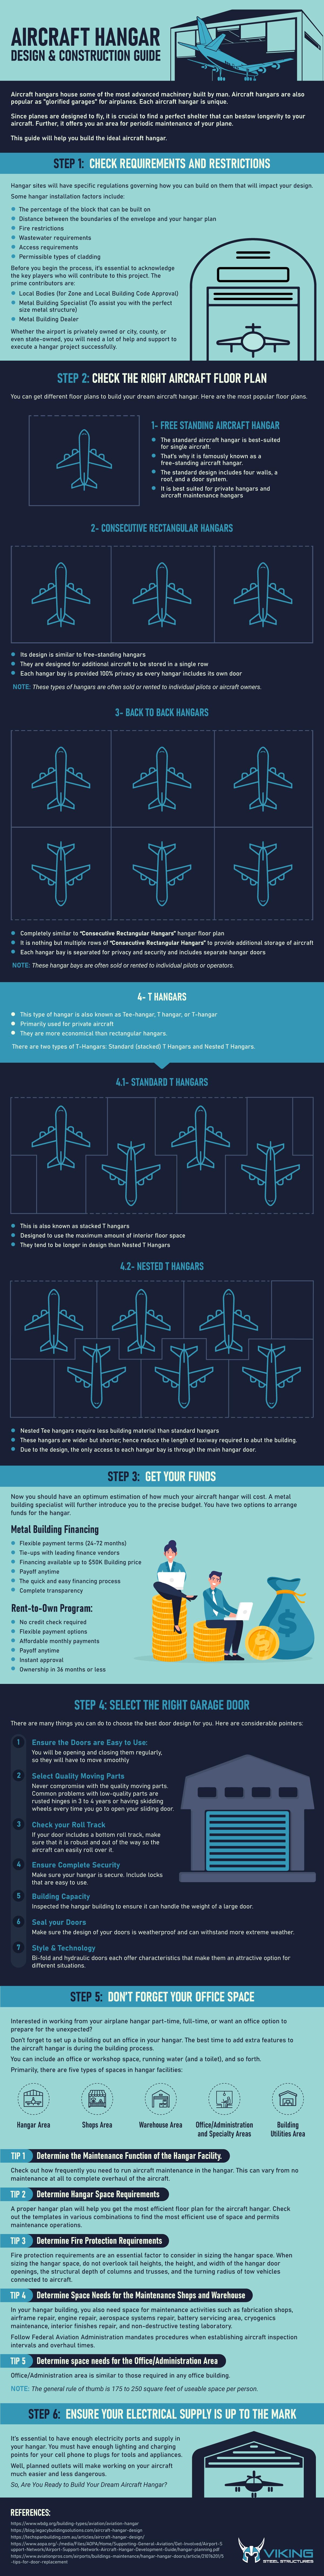 Aircraft Hangar Design & Construction Guide